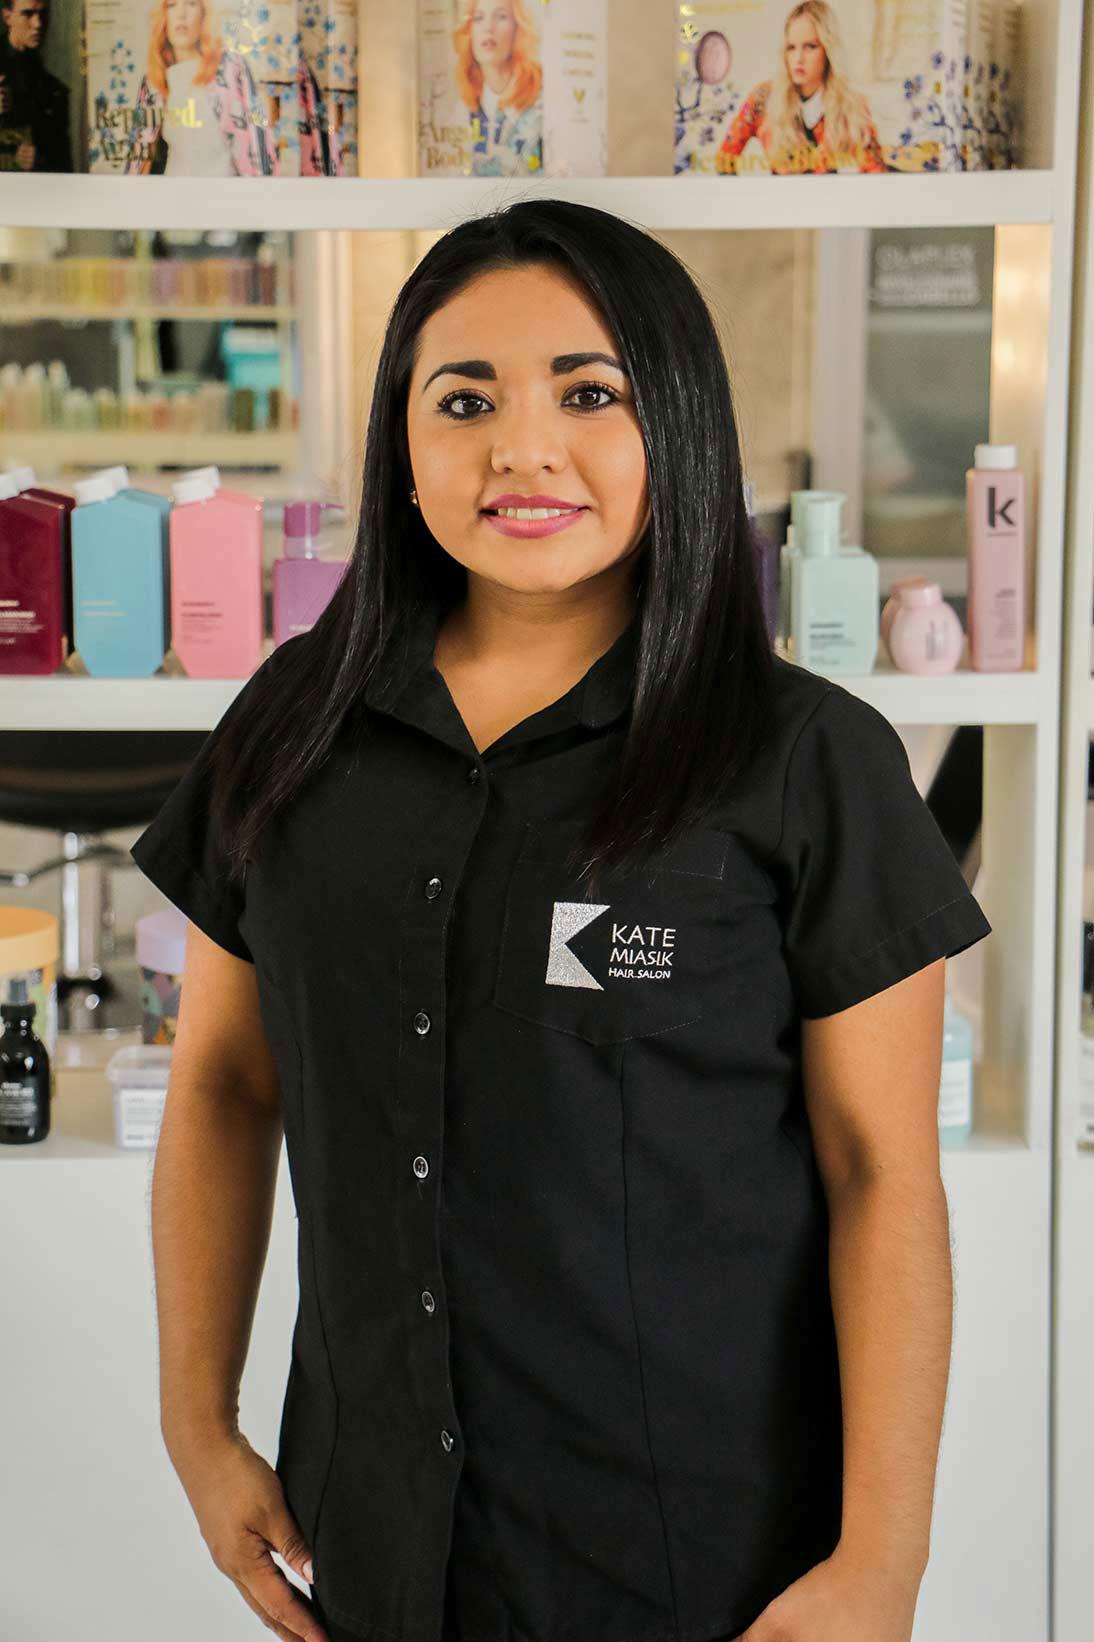 Adaly - Kate Miasik Salon